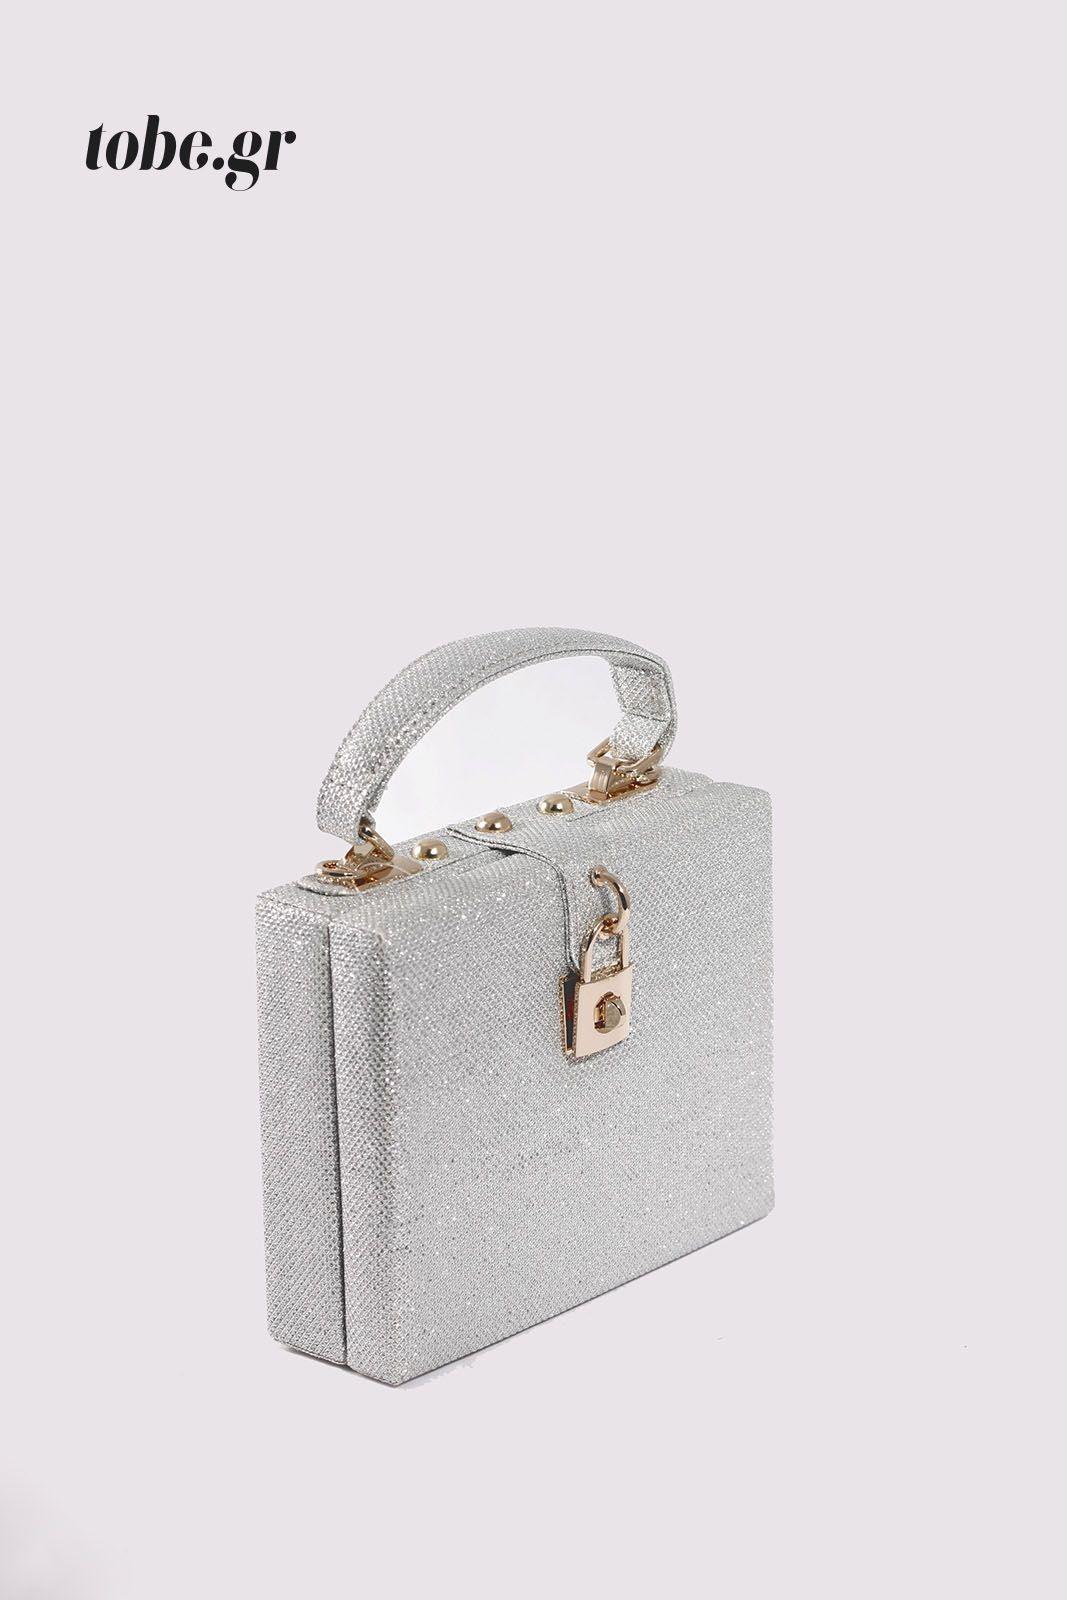 2f58c5eff1 Μικρή τσάντα βαλιτσάκι με έντονη εντυπωσιακή λάμψη γκλίτερ και χρυσές  λεπτομέρειες. Κωδ. 117.043